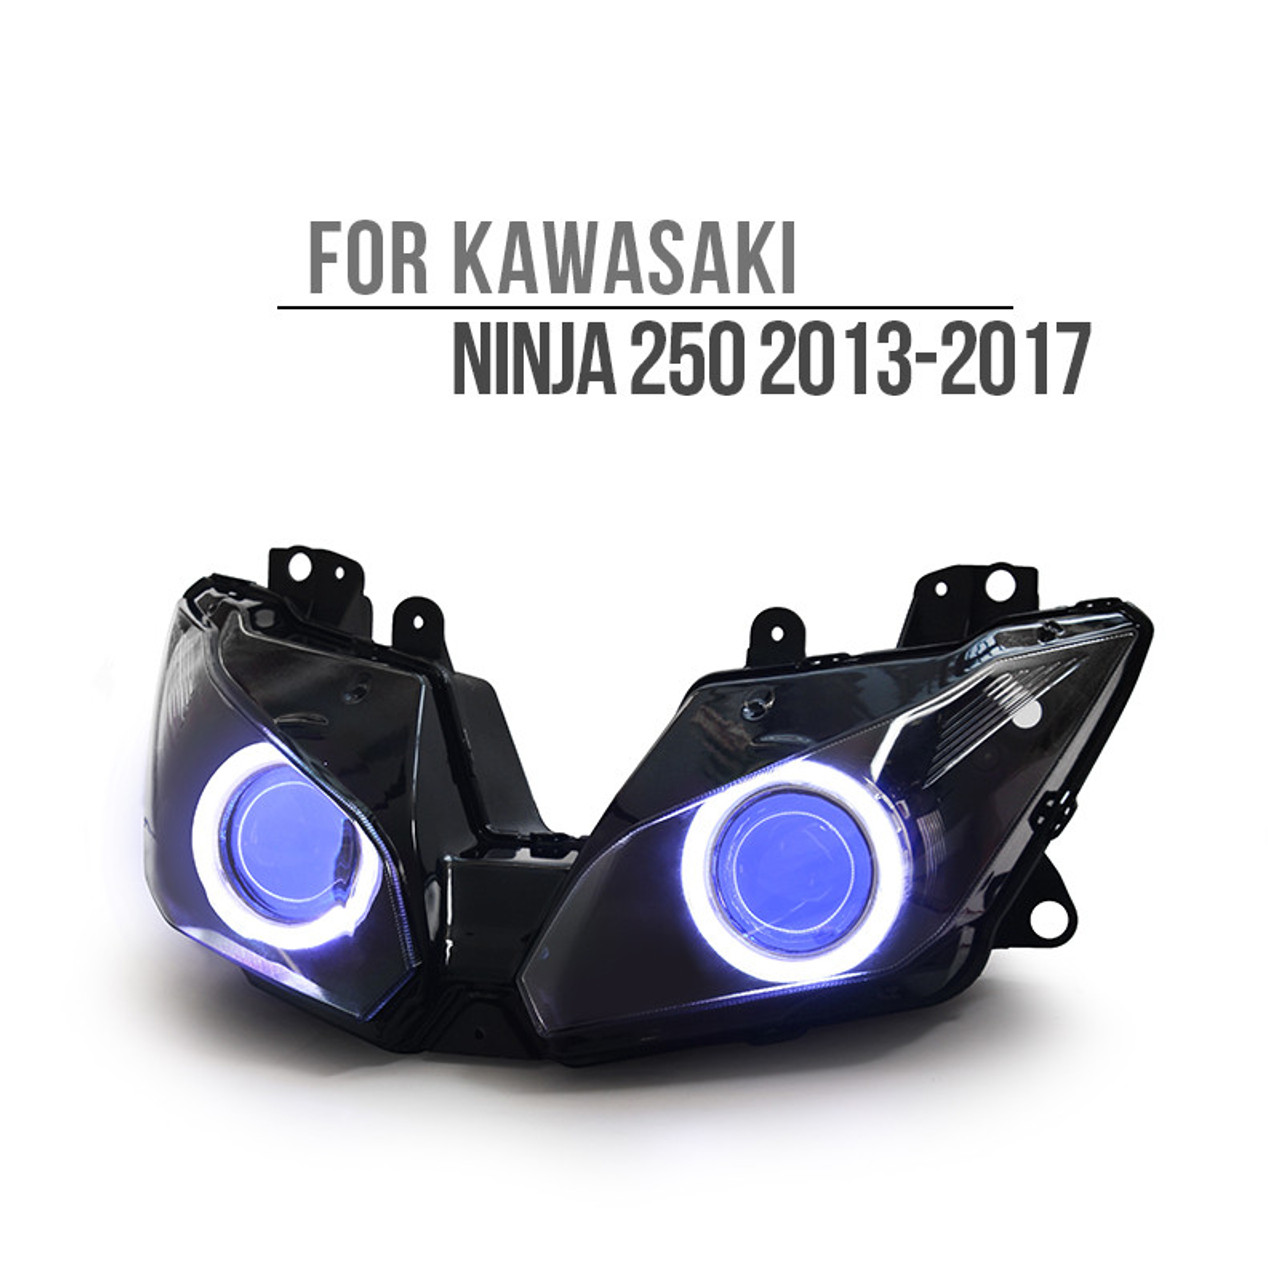 Kawasaki Ninja 250 Headlight 2013 2014 2015 2016 2017